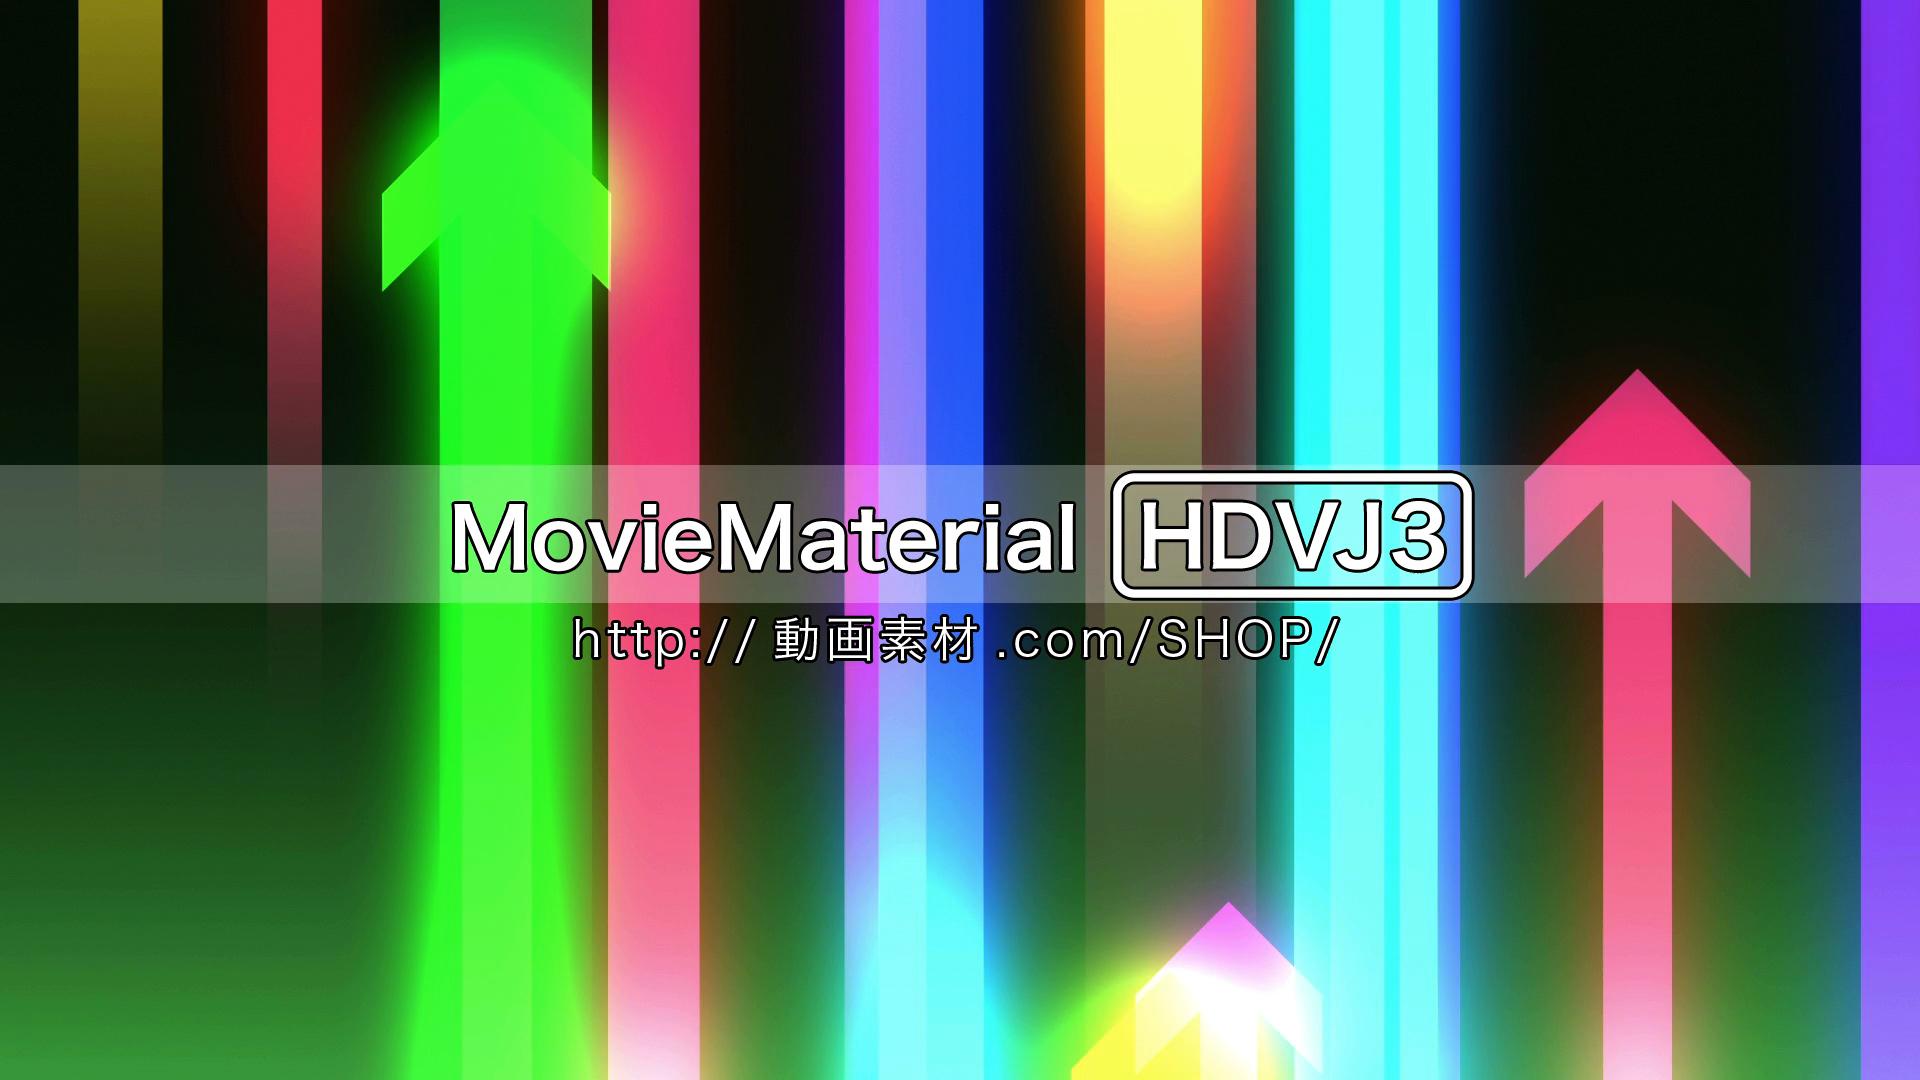 MovieMaterial HDVJ3 フルハイビジョンVJ動画素材集 画像6